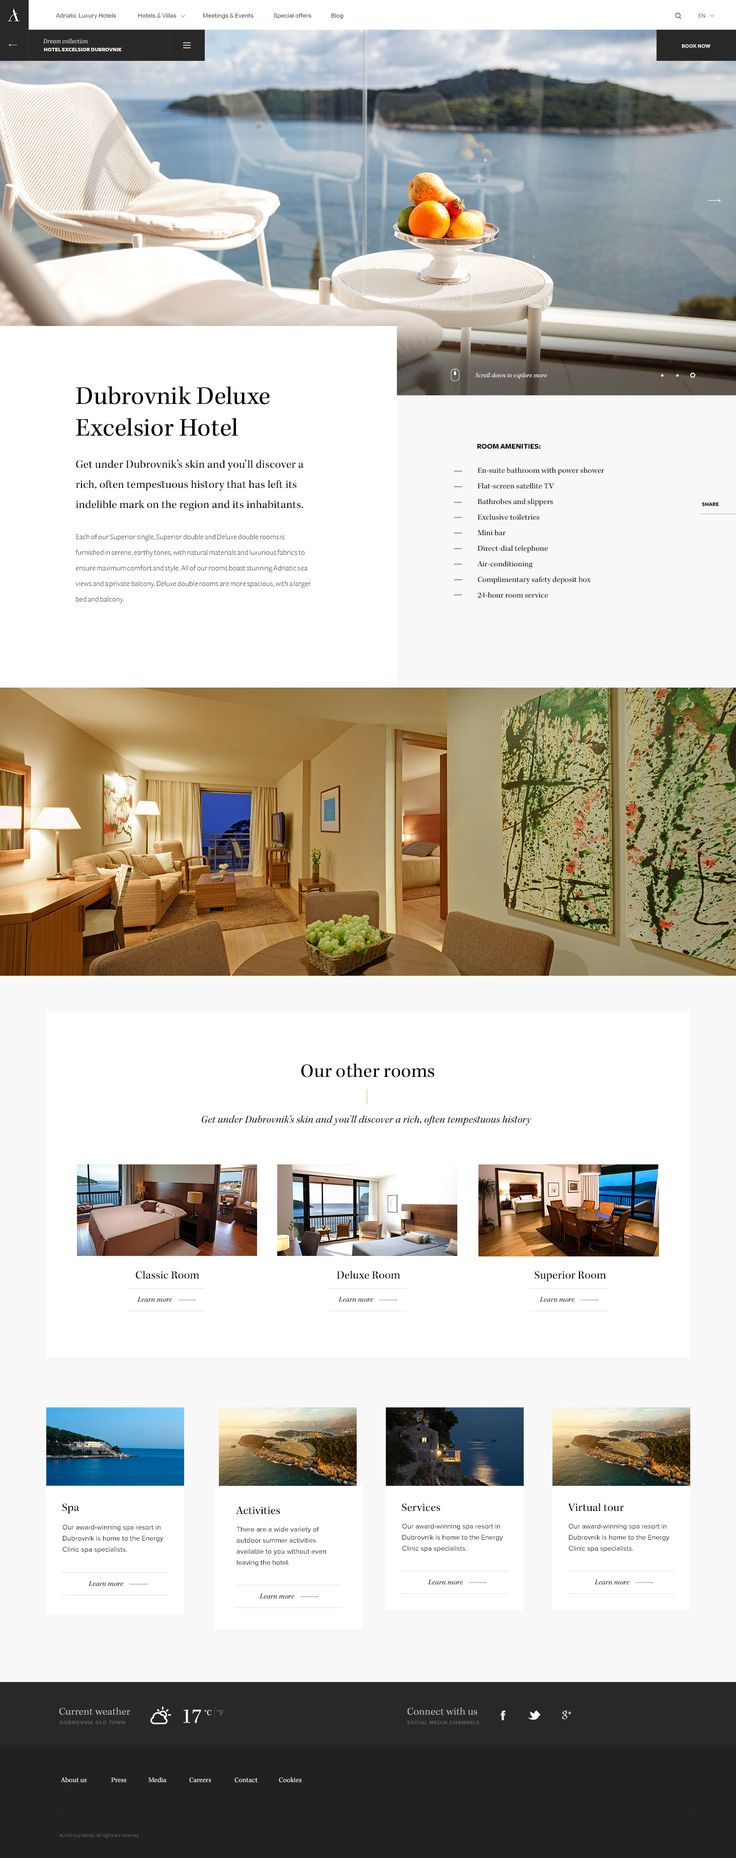 163 best RESPONSIVE images on Pinterest | Website designs, Website ...